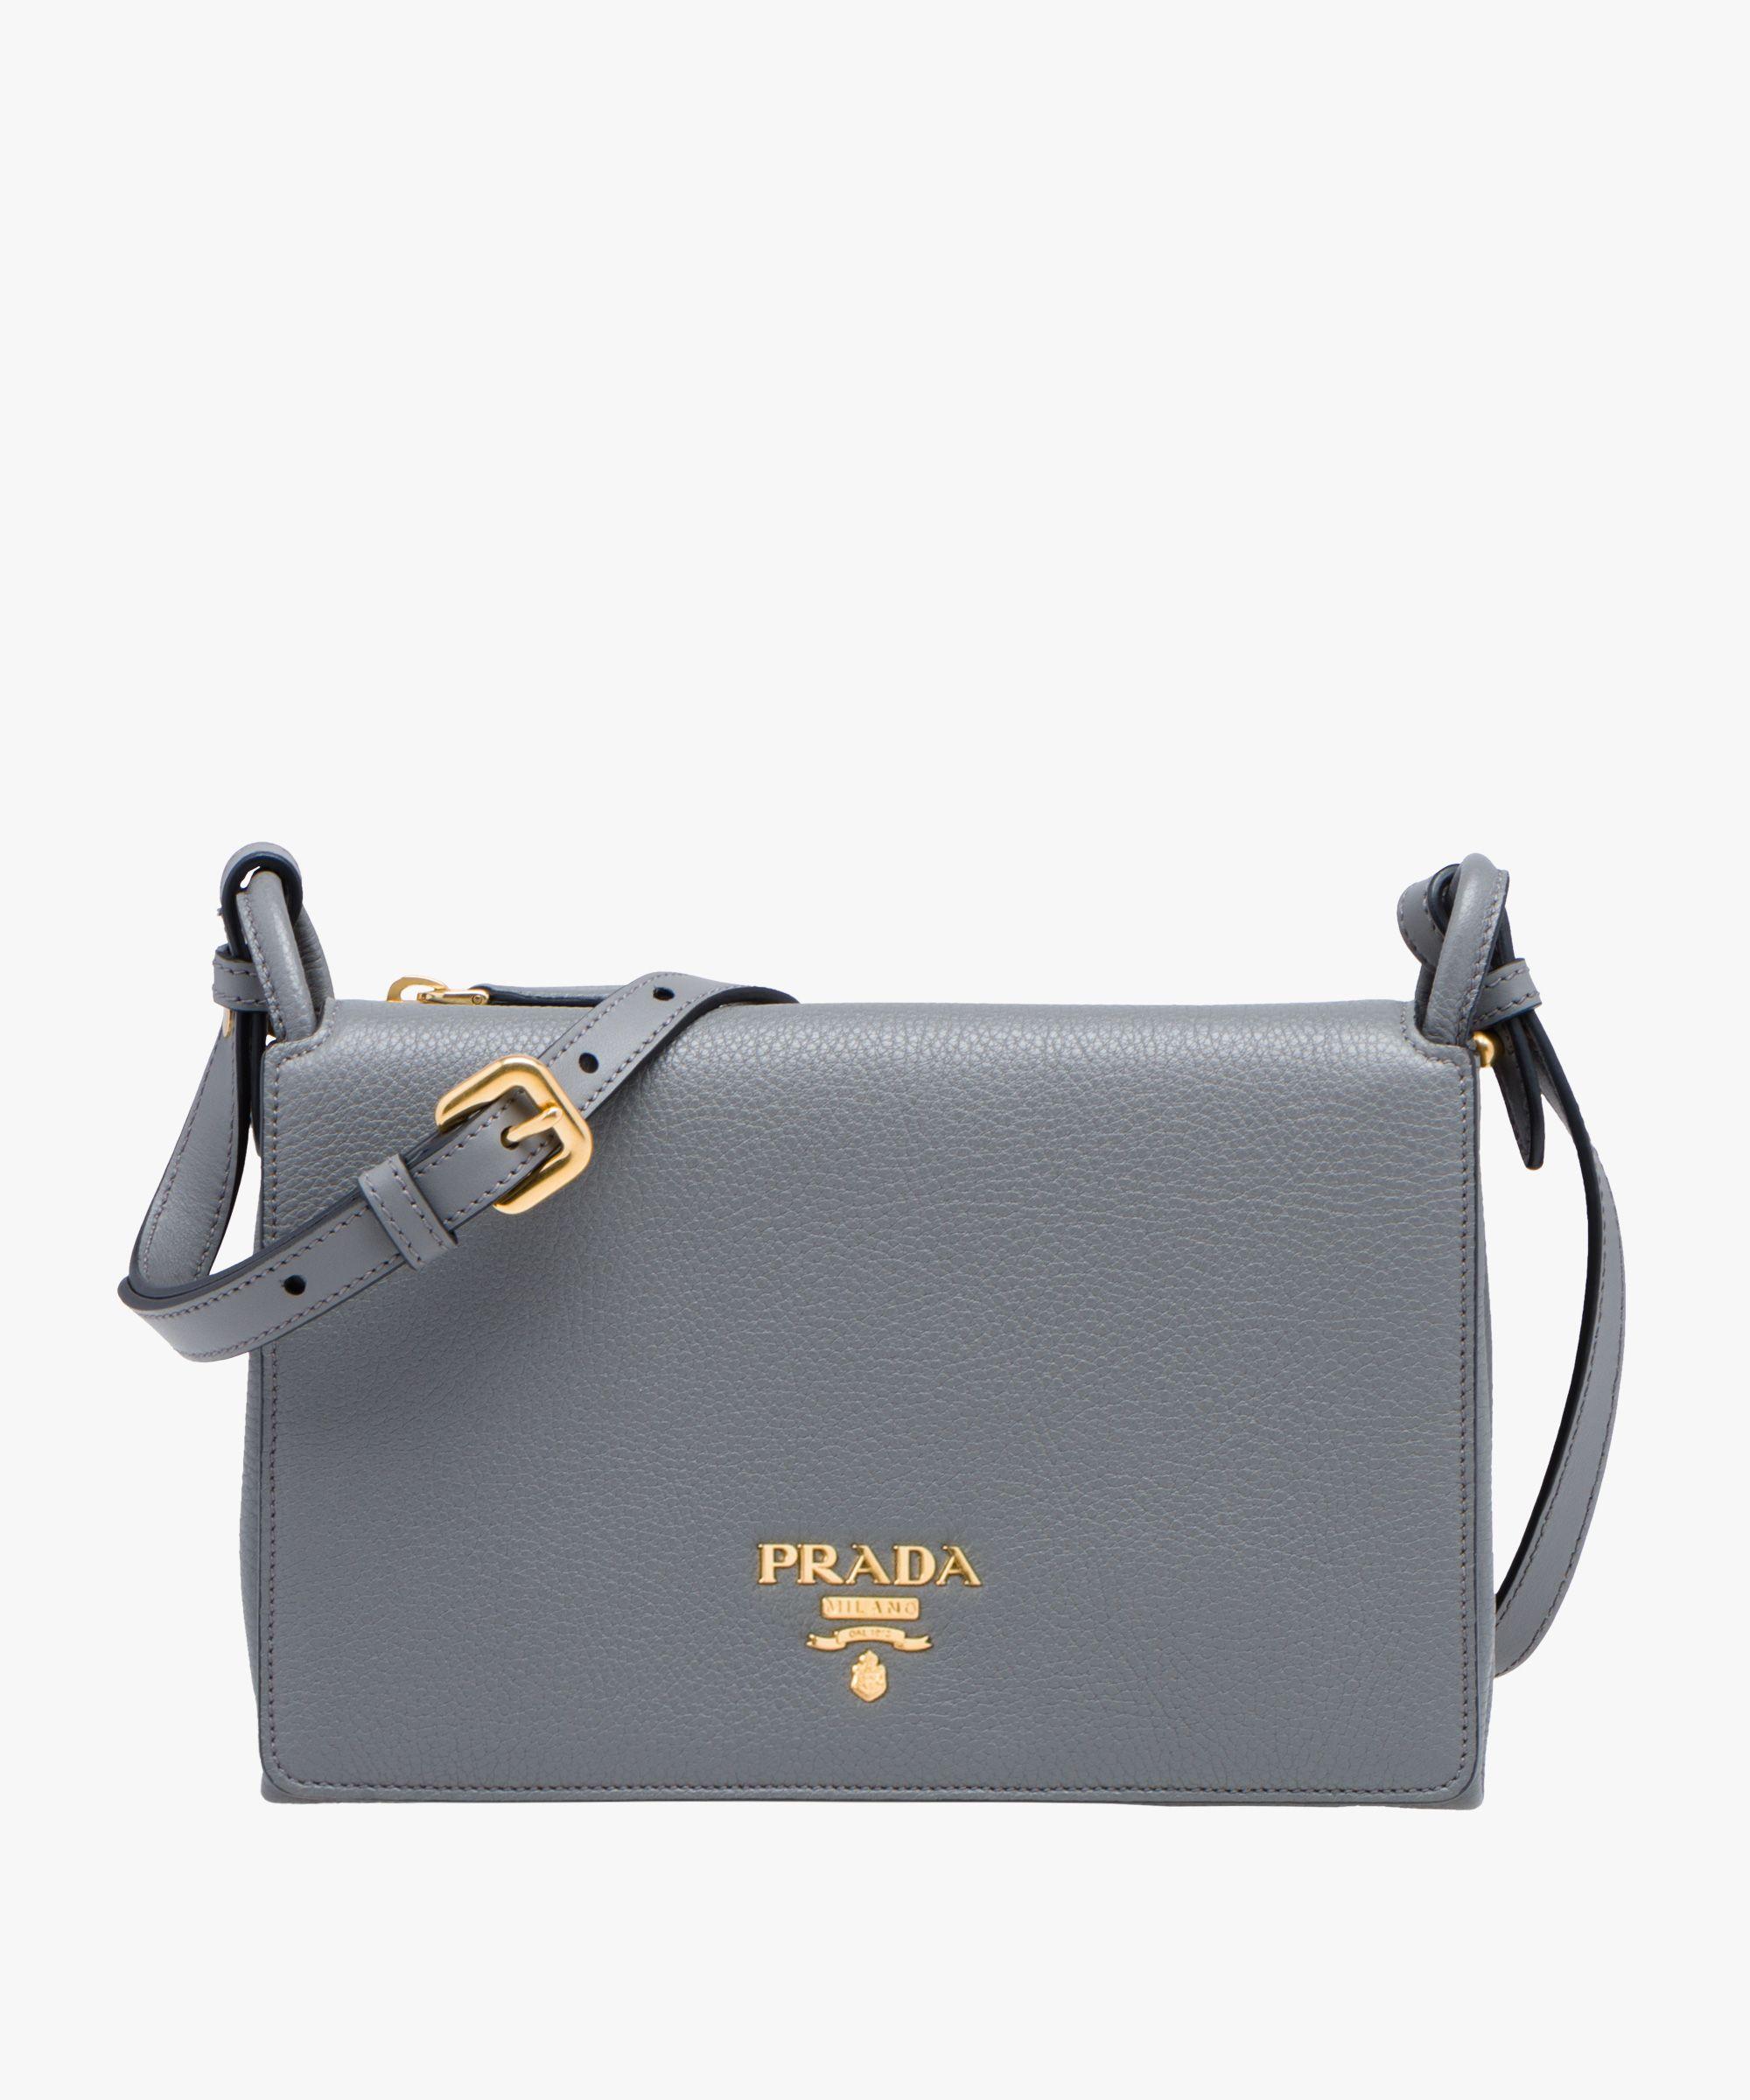 04b16f4ca554 Thumbnail 1 | prada | Leather shoulder bag, Bags, Shoulder Bag